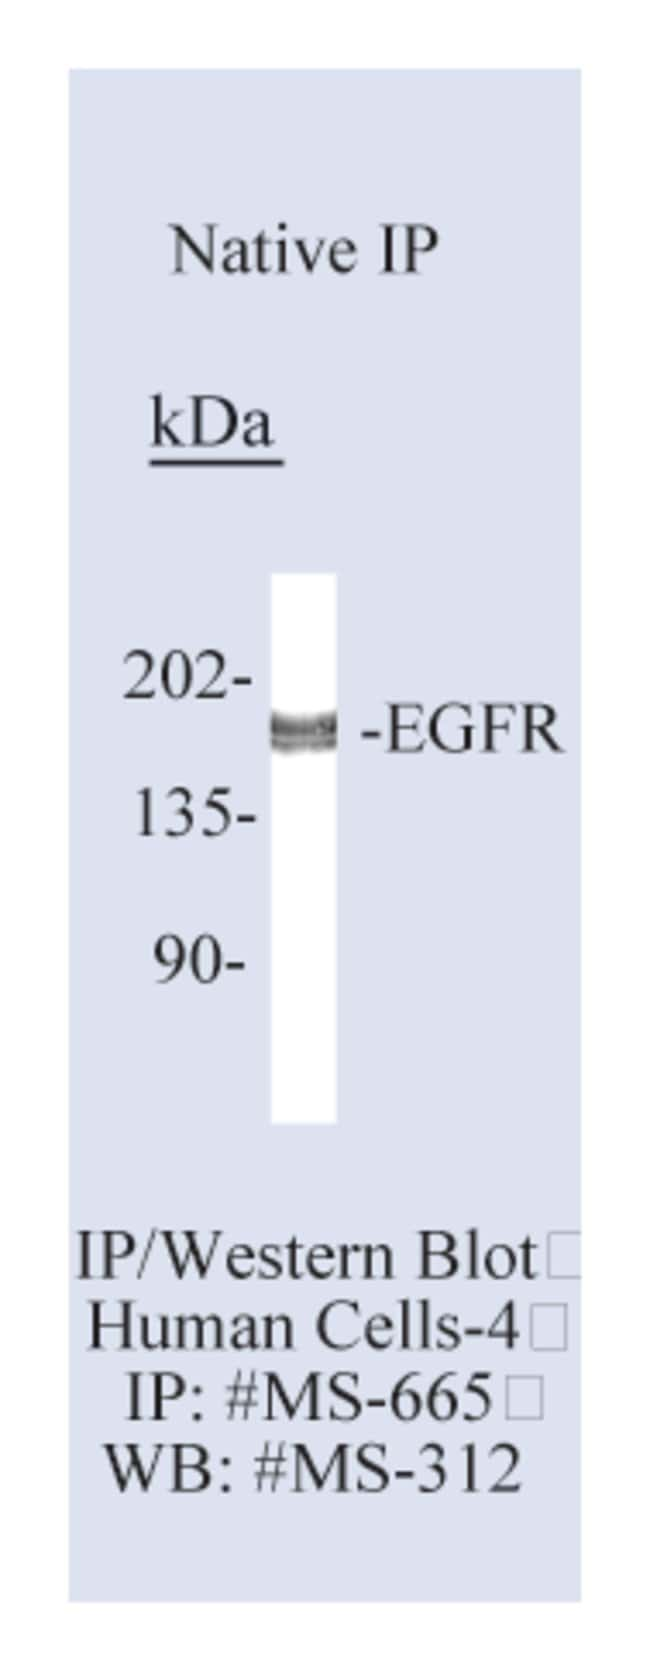 Thermo Scientific Lab Vision Epidermal Growth Factor Receptor/EGFR Ab-15,